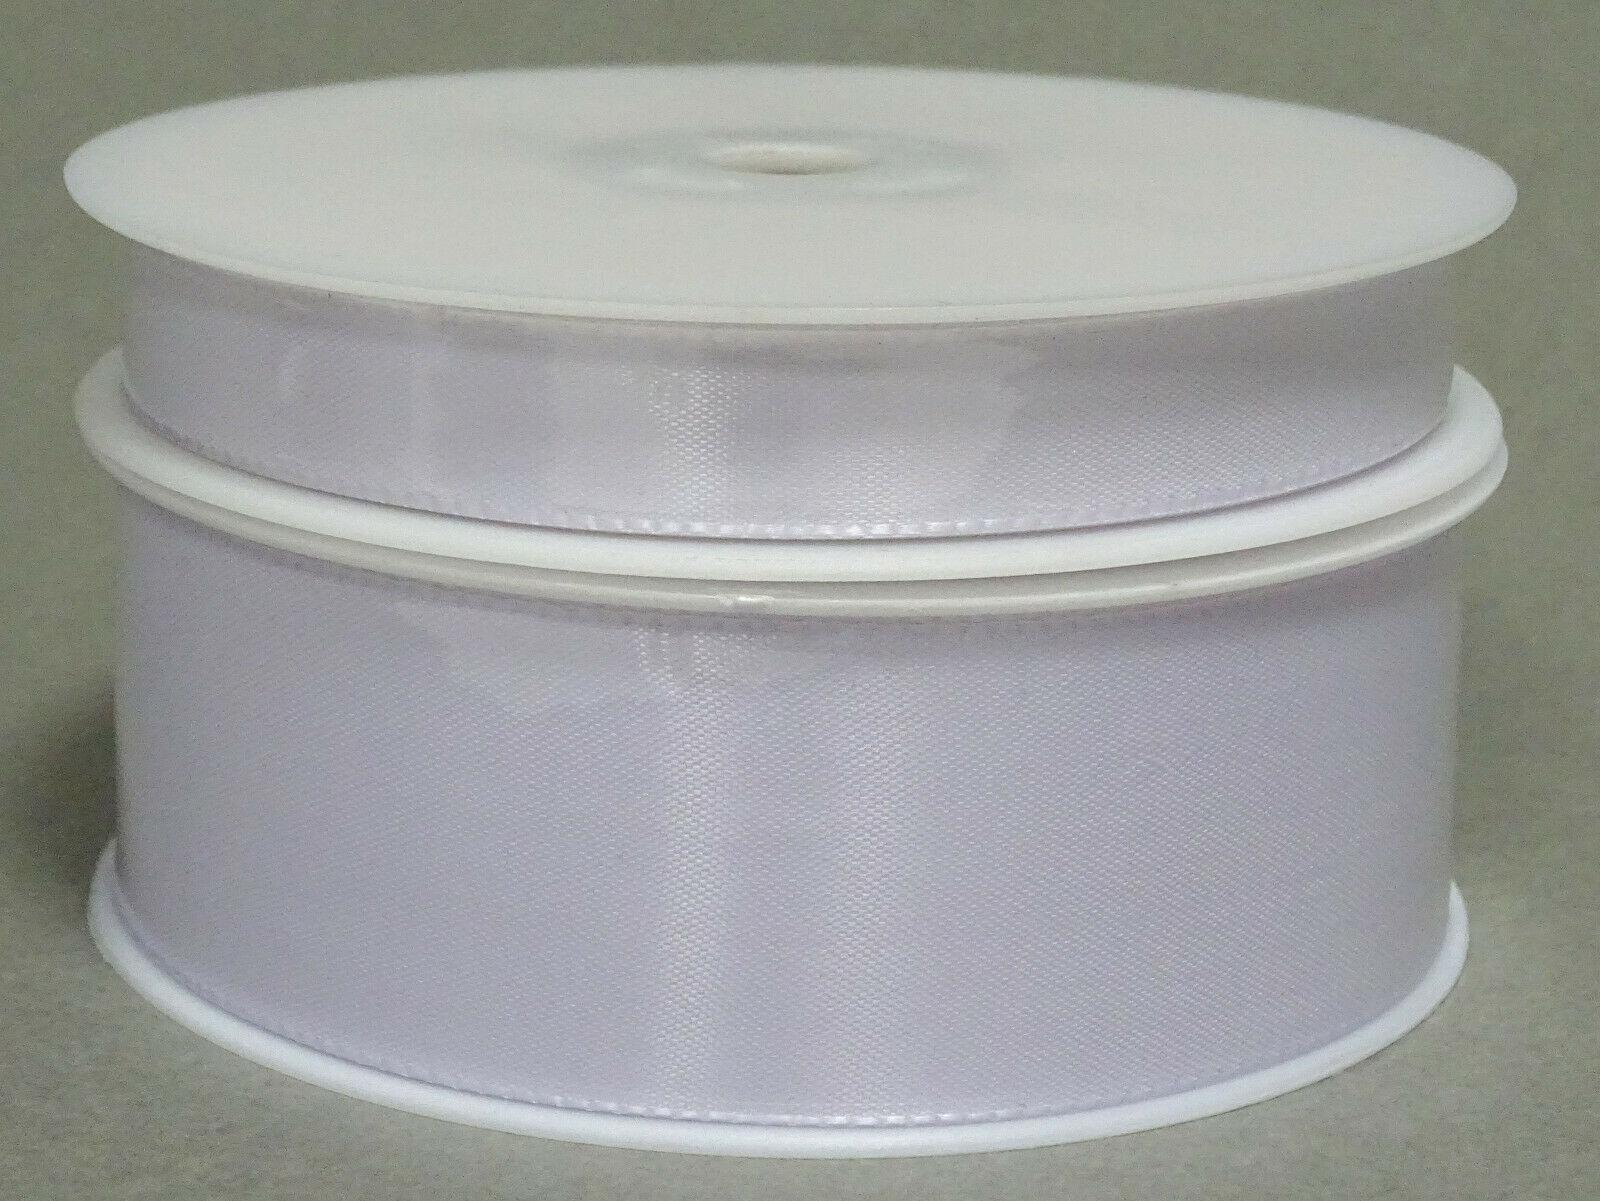 Seidenband Schleifenband 50 m x 15 mm / 40 mm Dekoband ab 0,08 €/m Geschenkband  - Weiß 101, 40 mm x 50 m